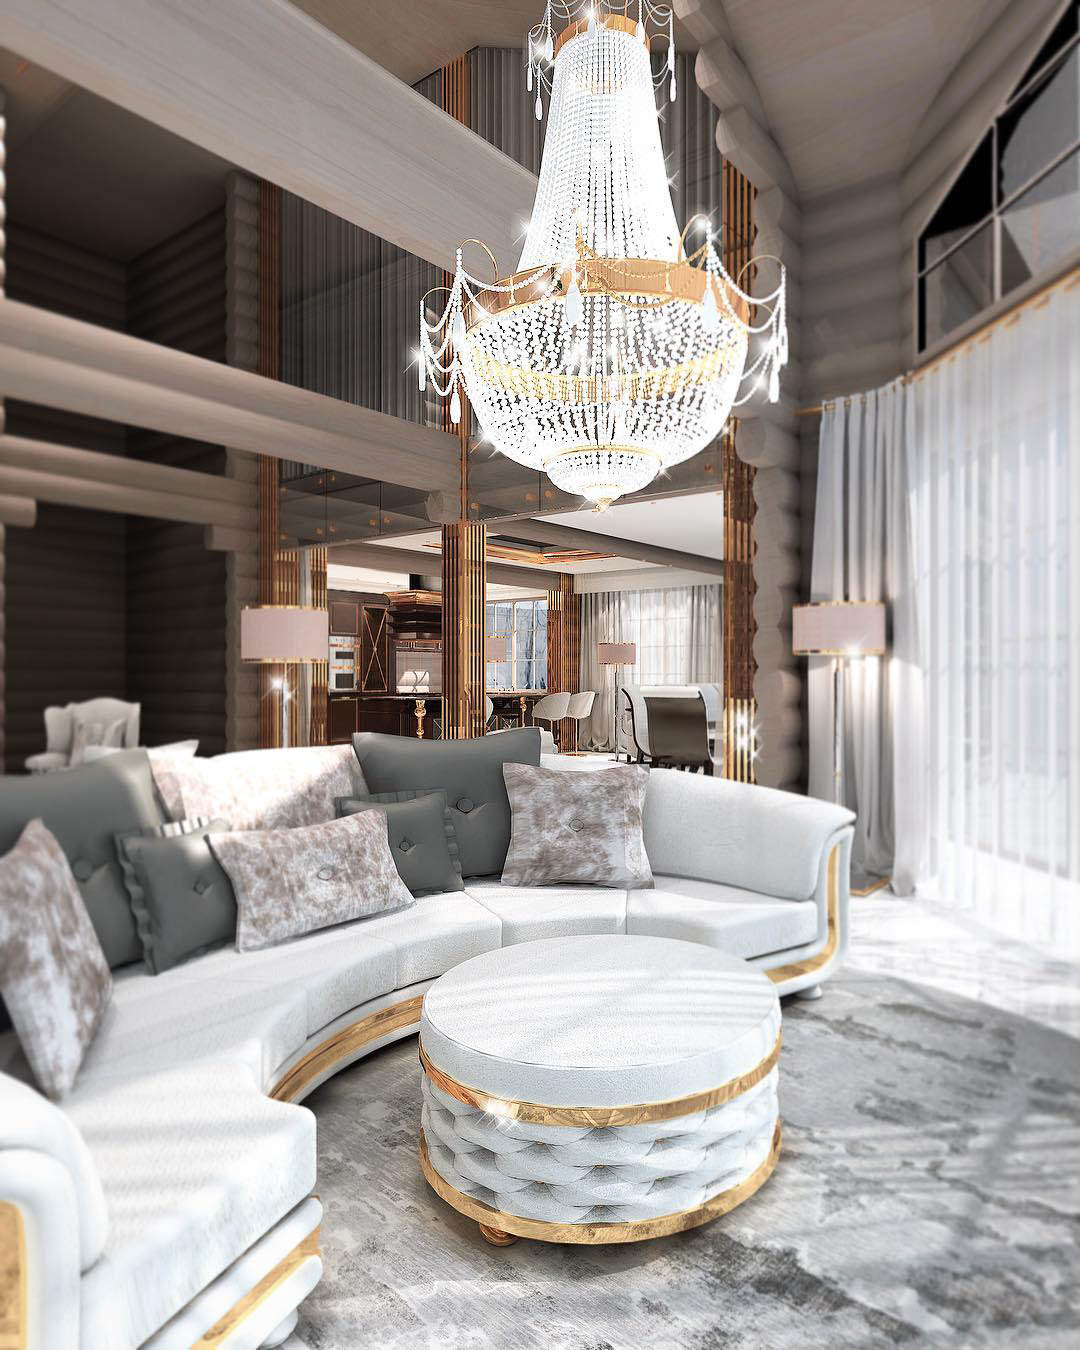 Constantin Frolov Interior Design | Luxury Living Room Ideas